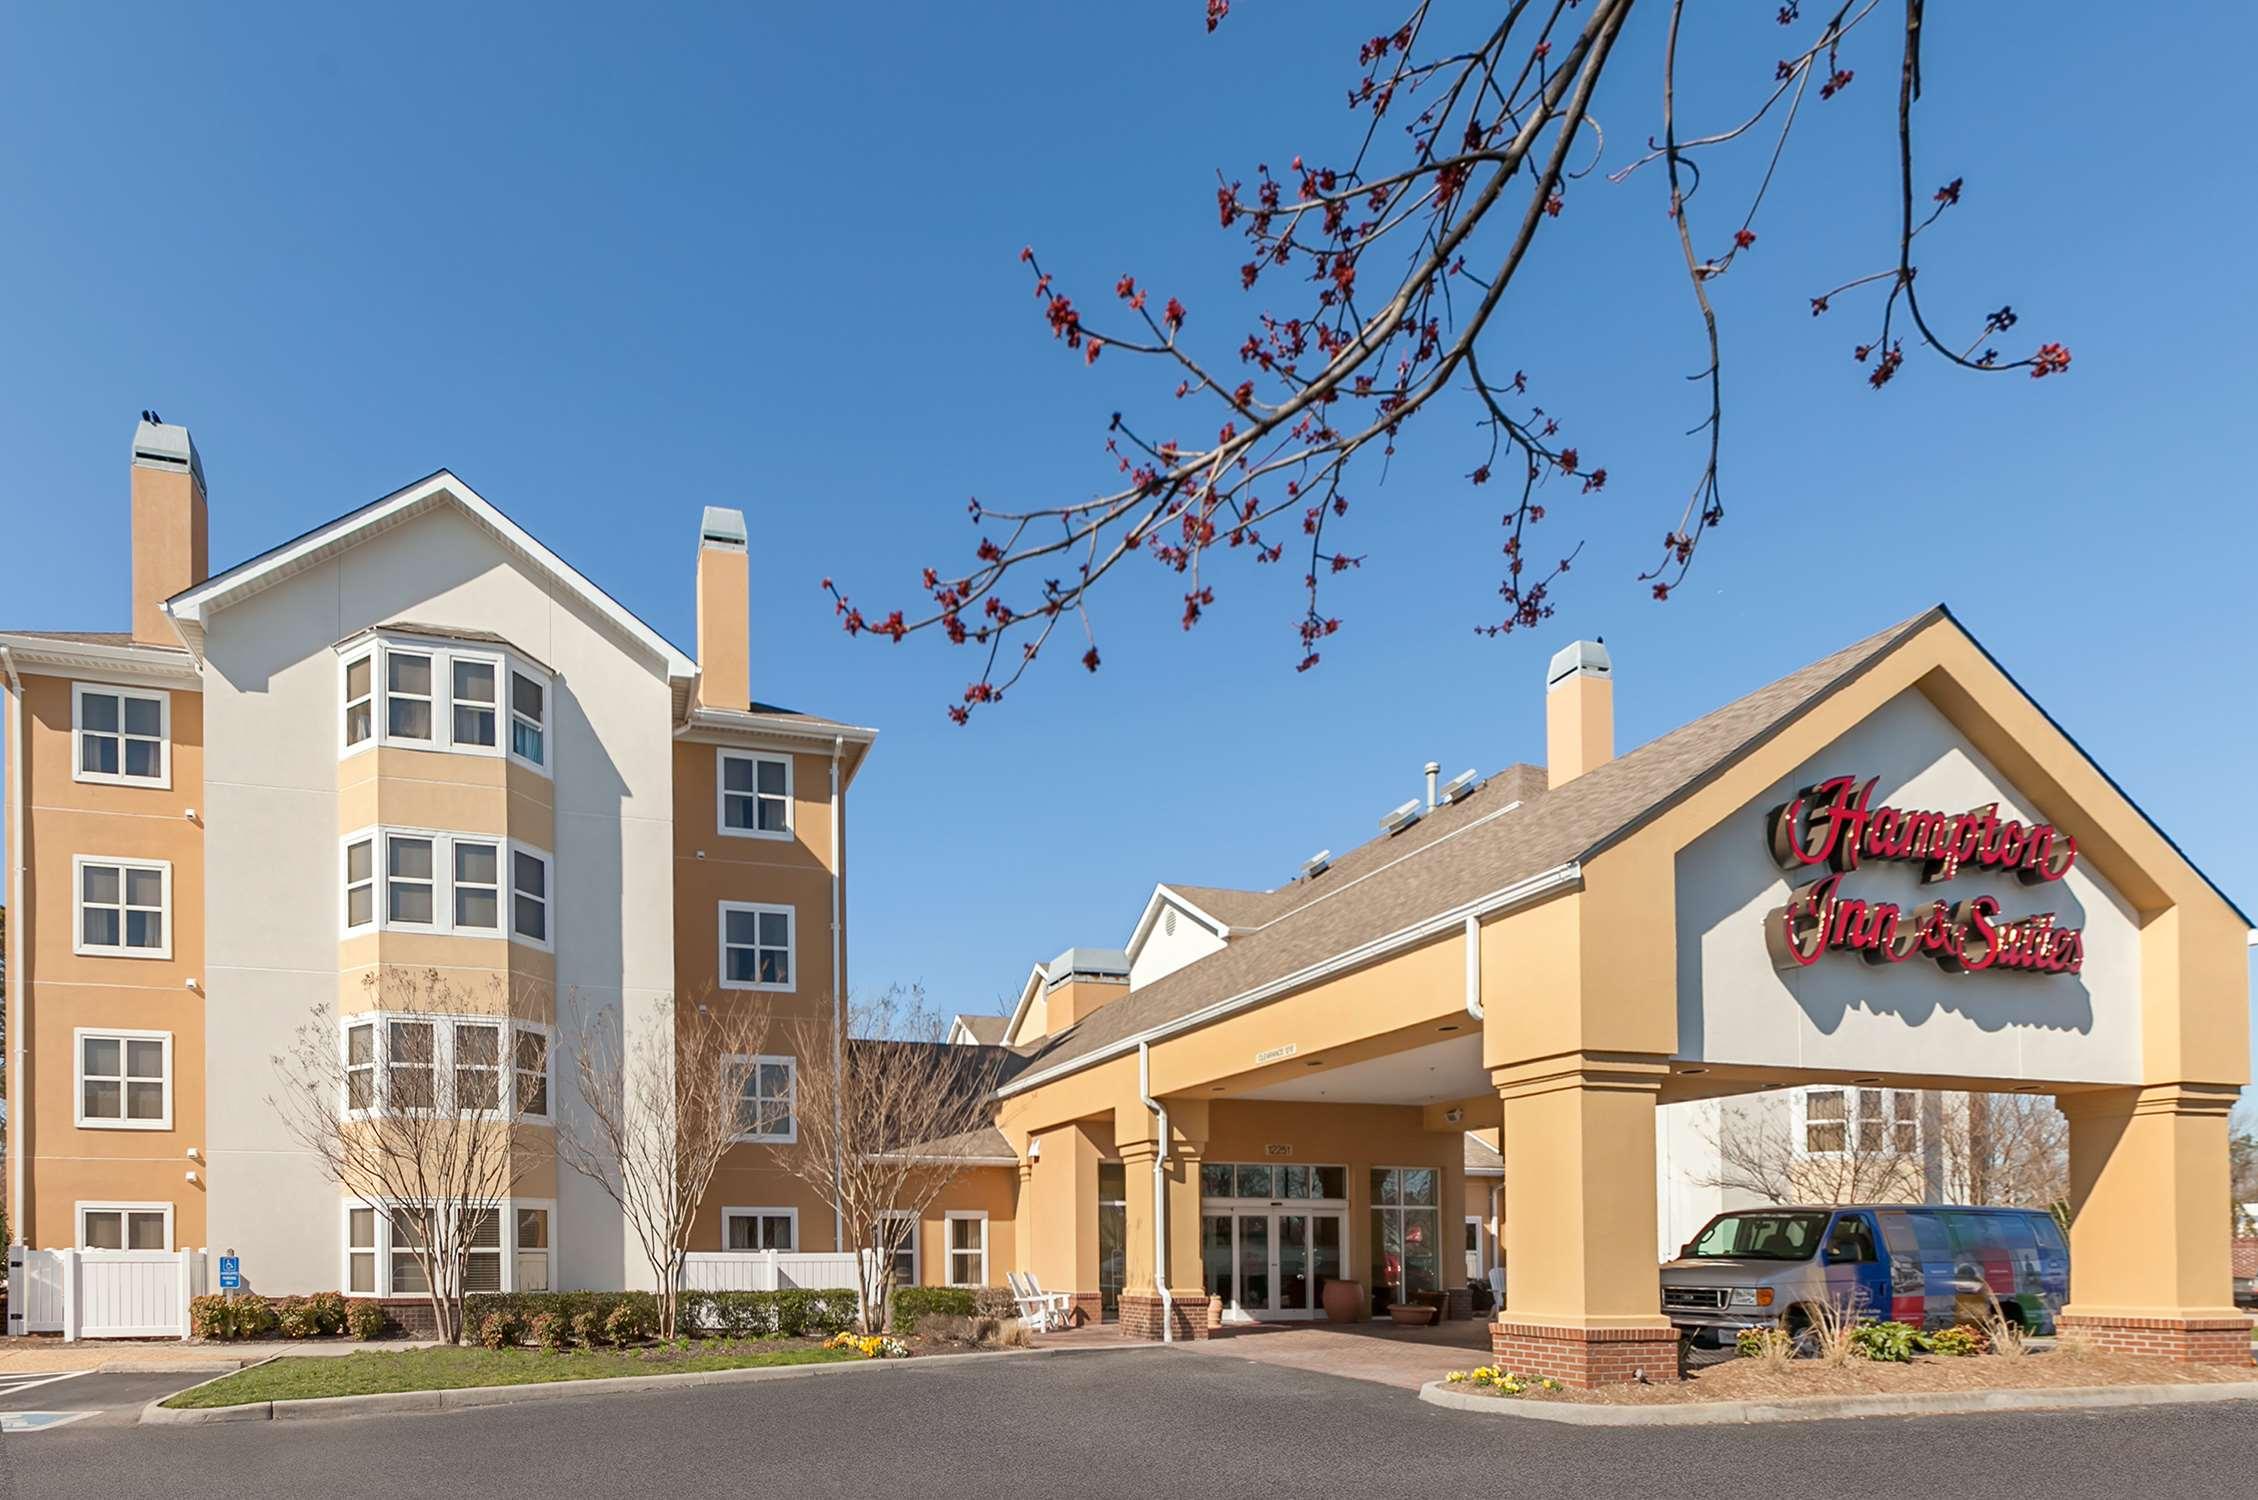 Hampton Inn & Suites Newport News (Oyster Point) image 0